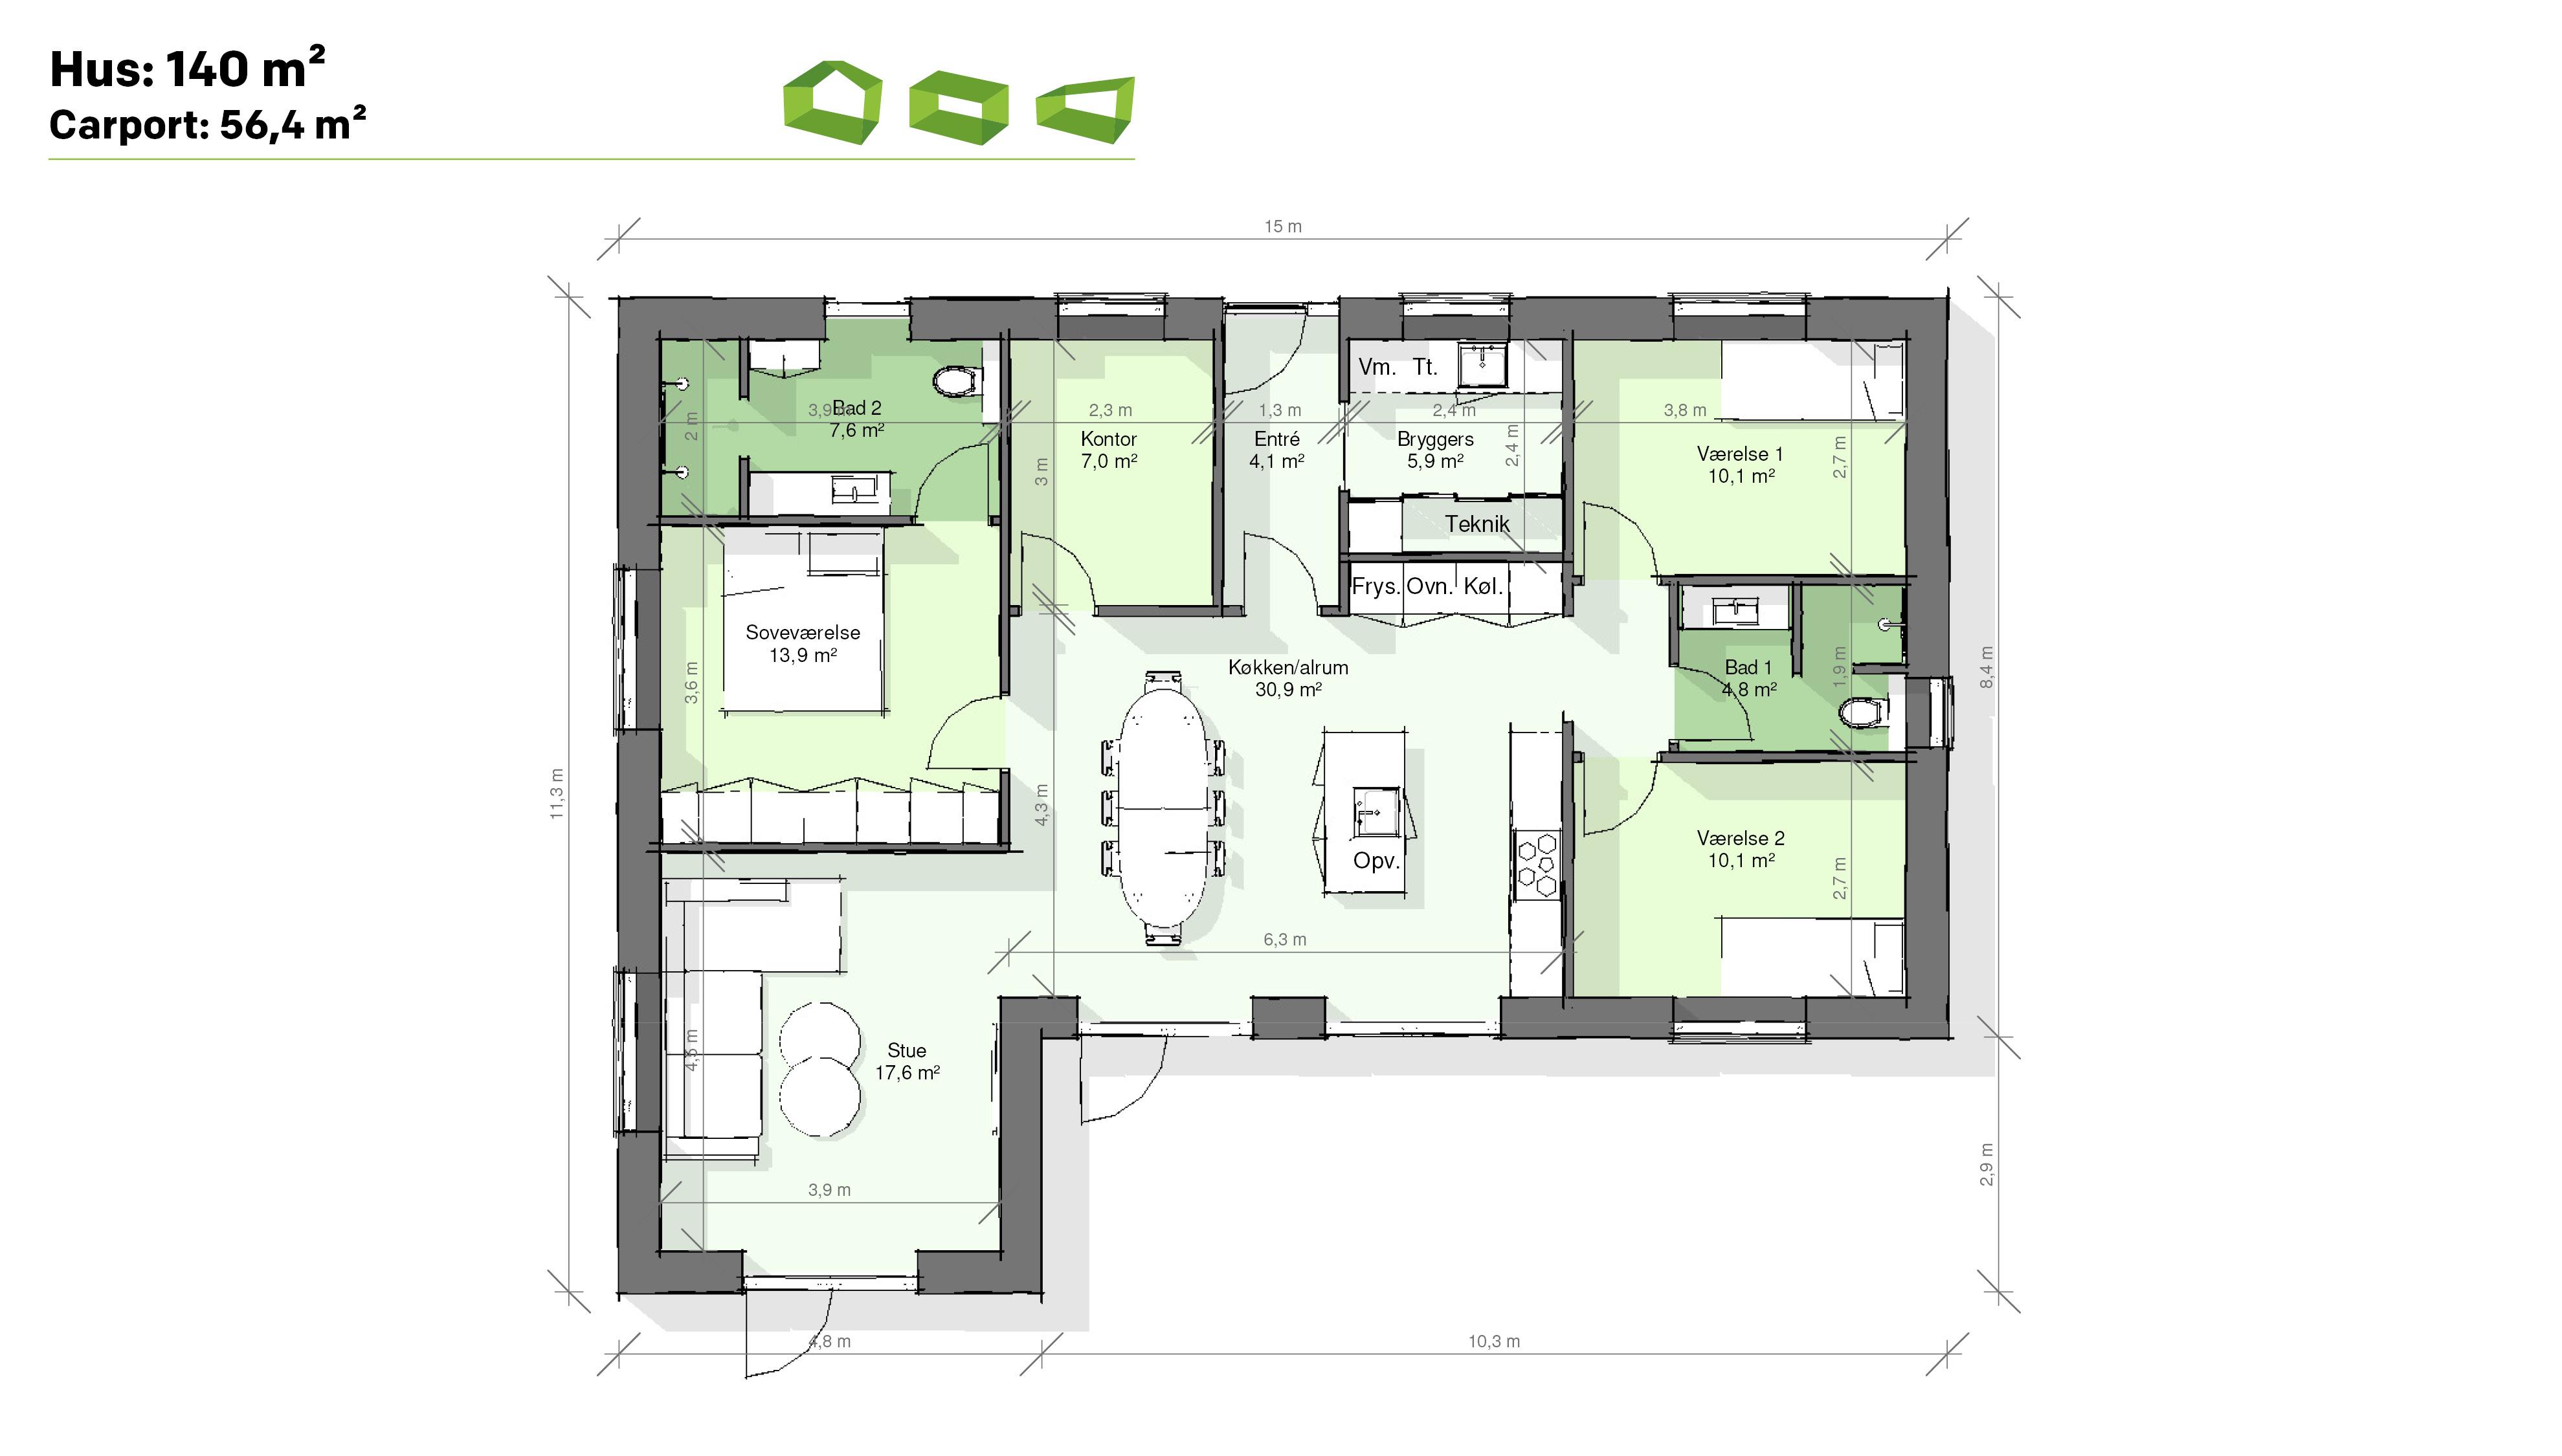 plantegning vinkelhus 140 m2